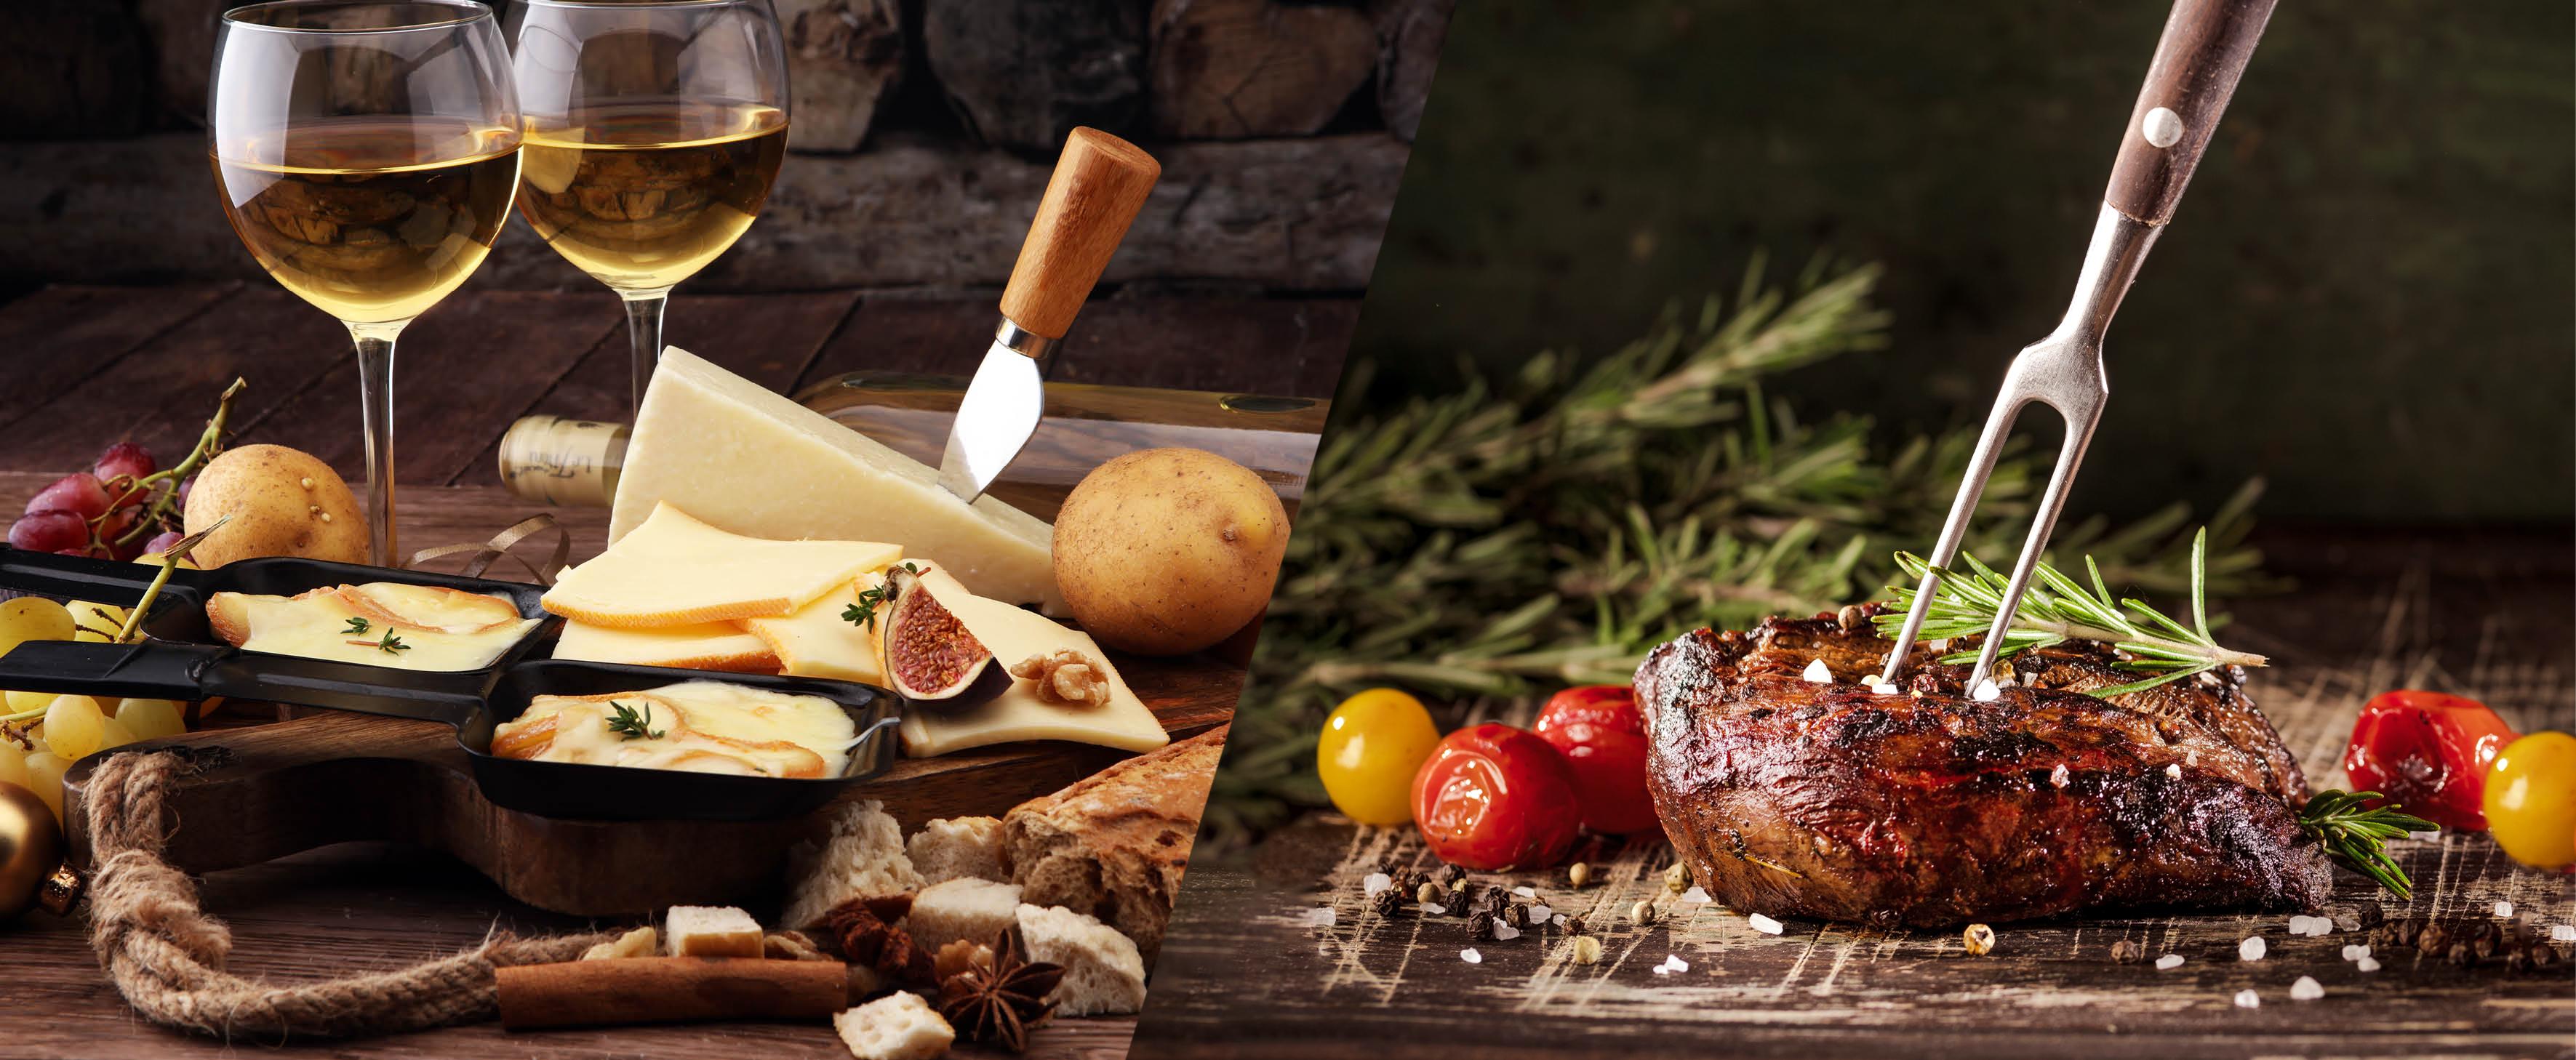 raclette englisch